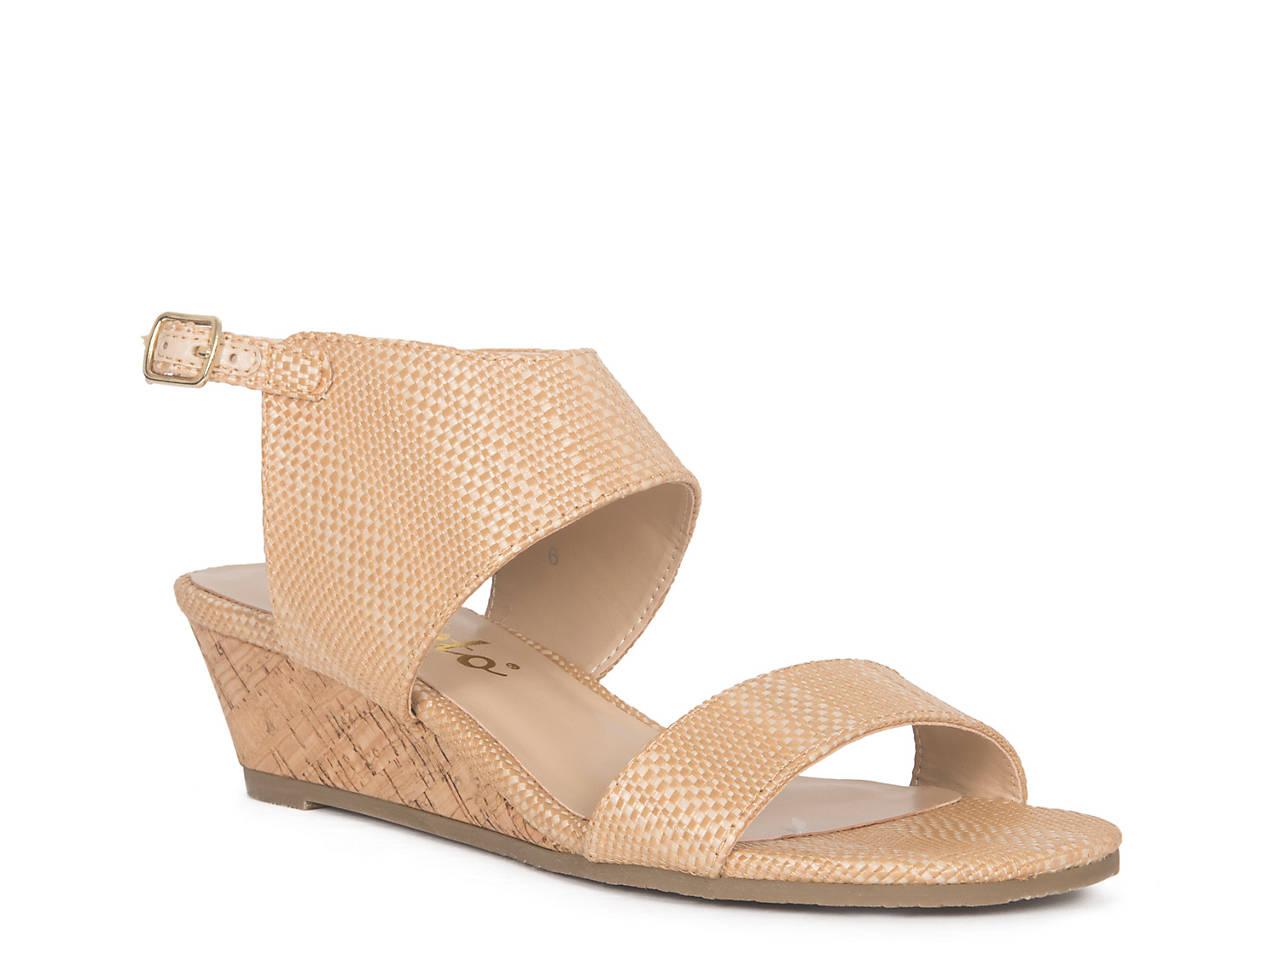 0f8f484d959 Callisto of California Bronzer Wedge Sandal Women s Shoes